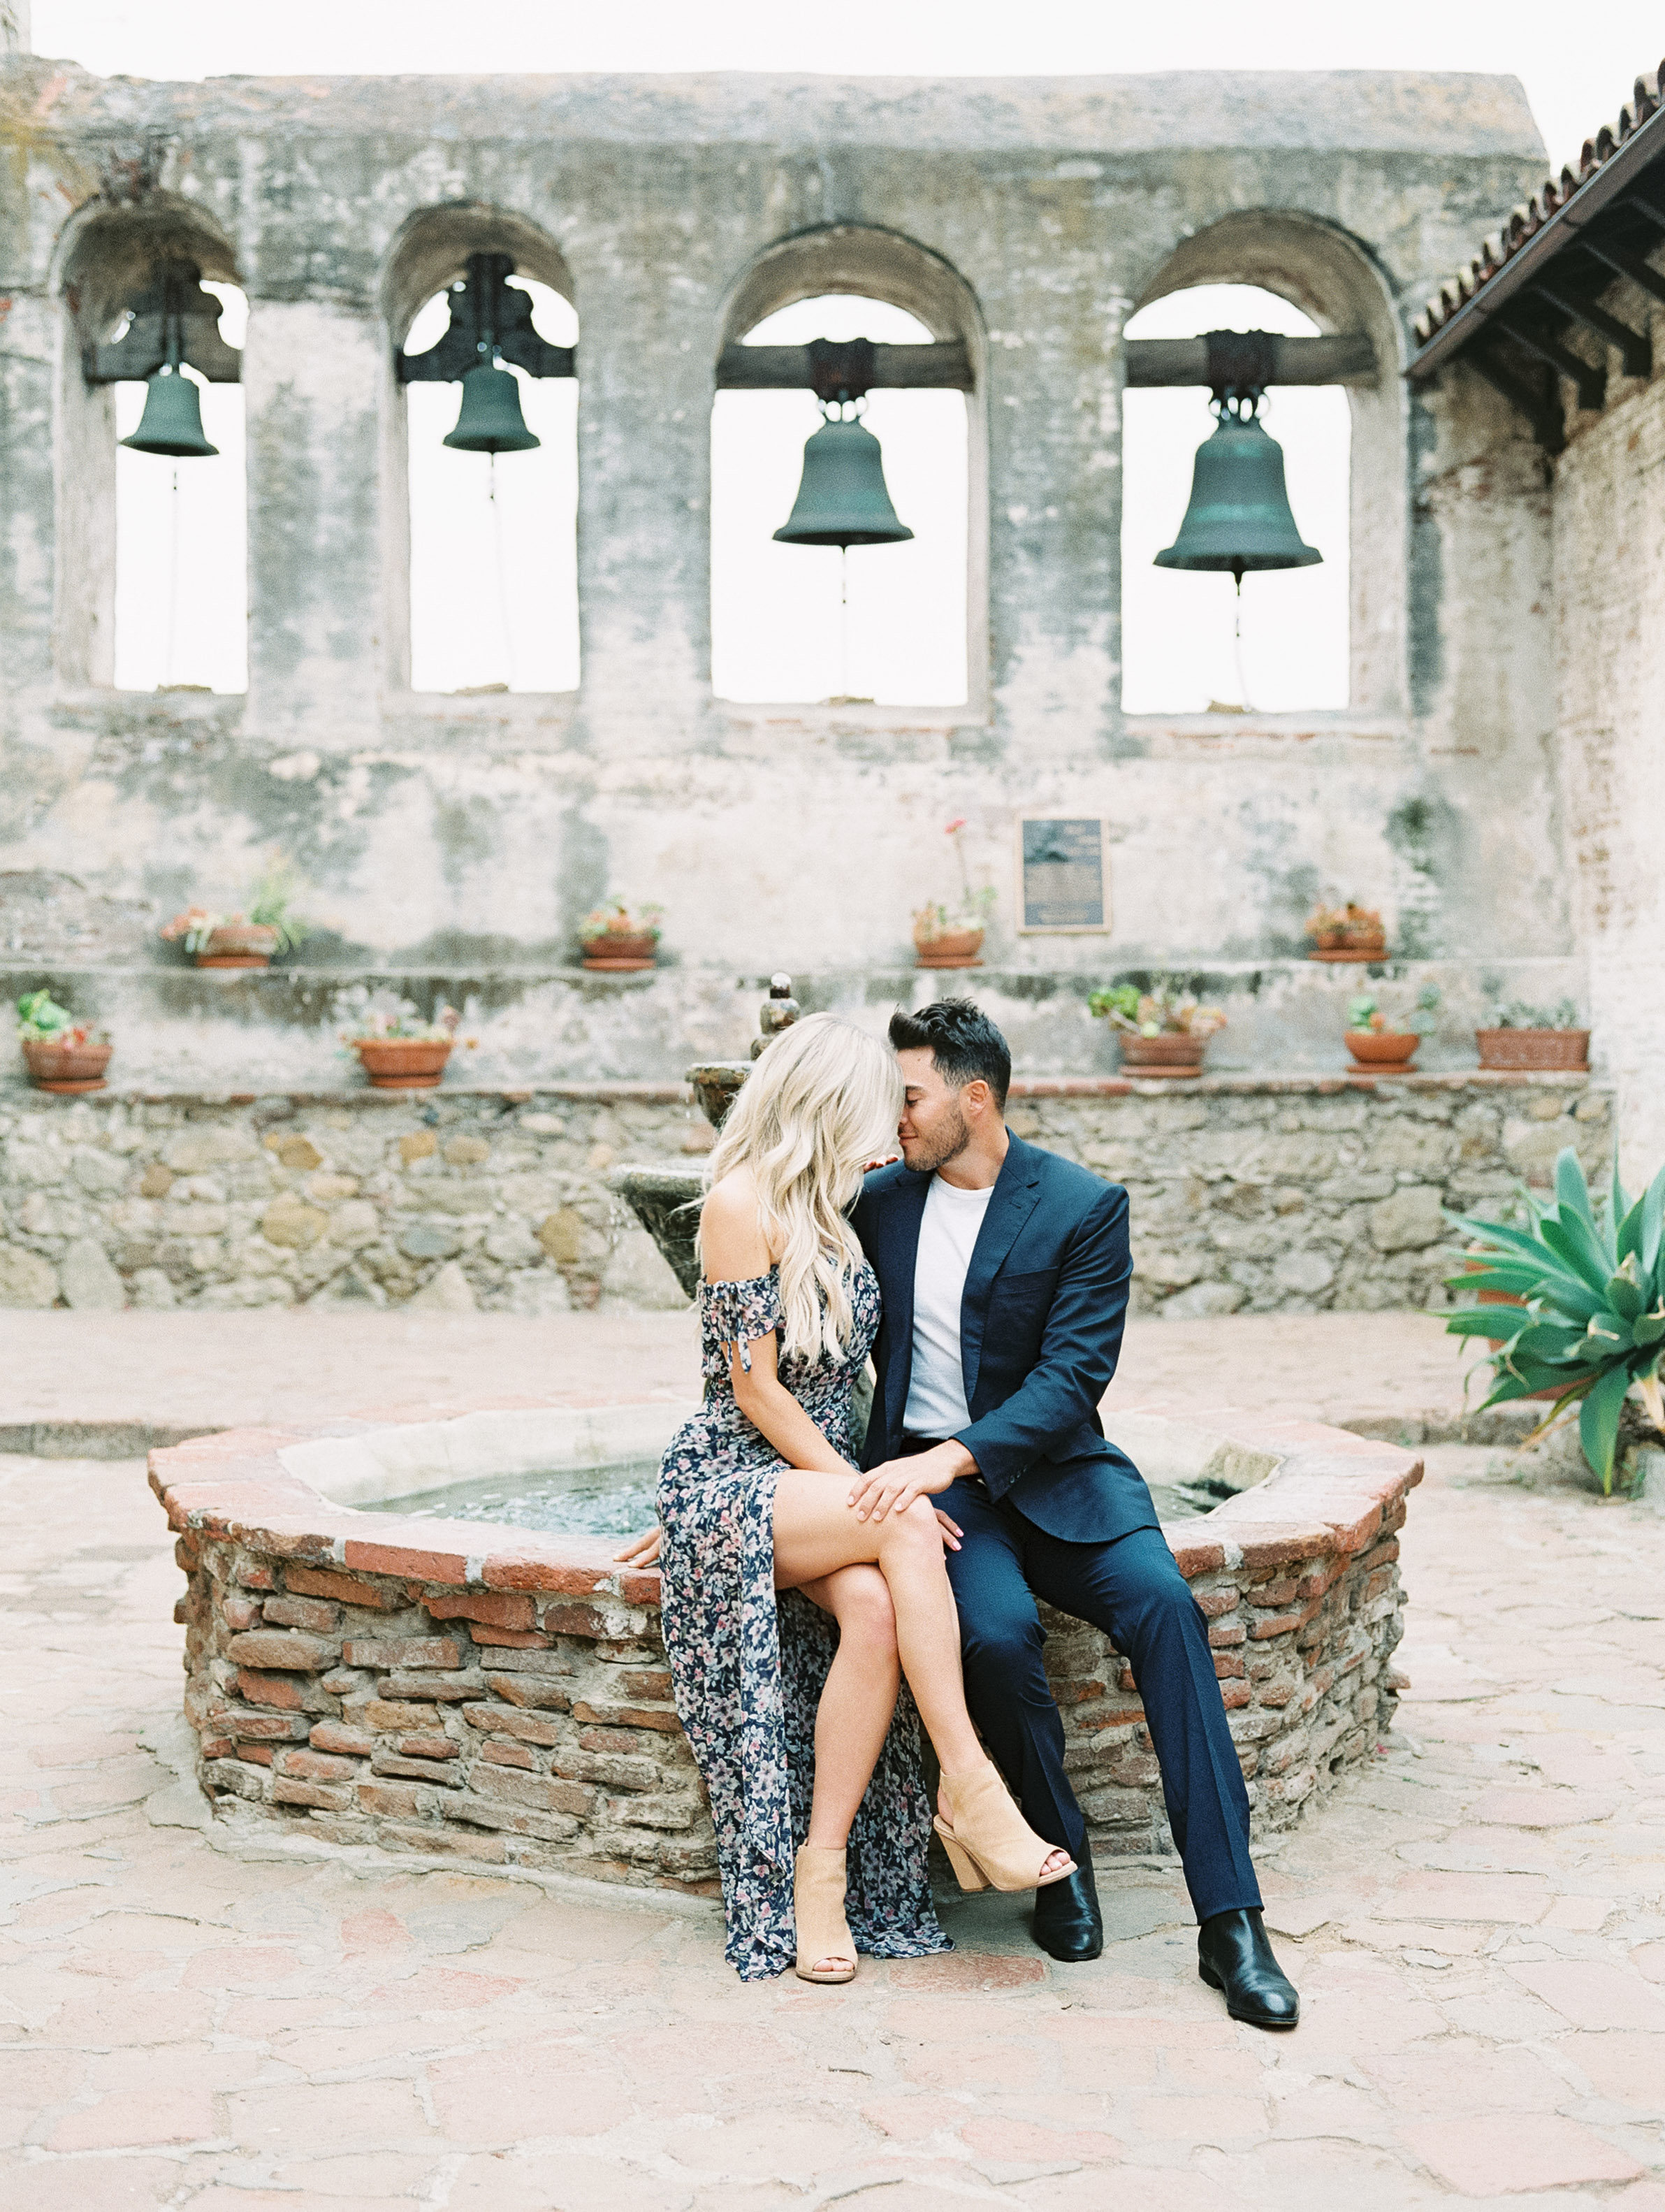 COUPLES  Jaylee & Michael   Mission San Juan Capistrano, CA